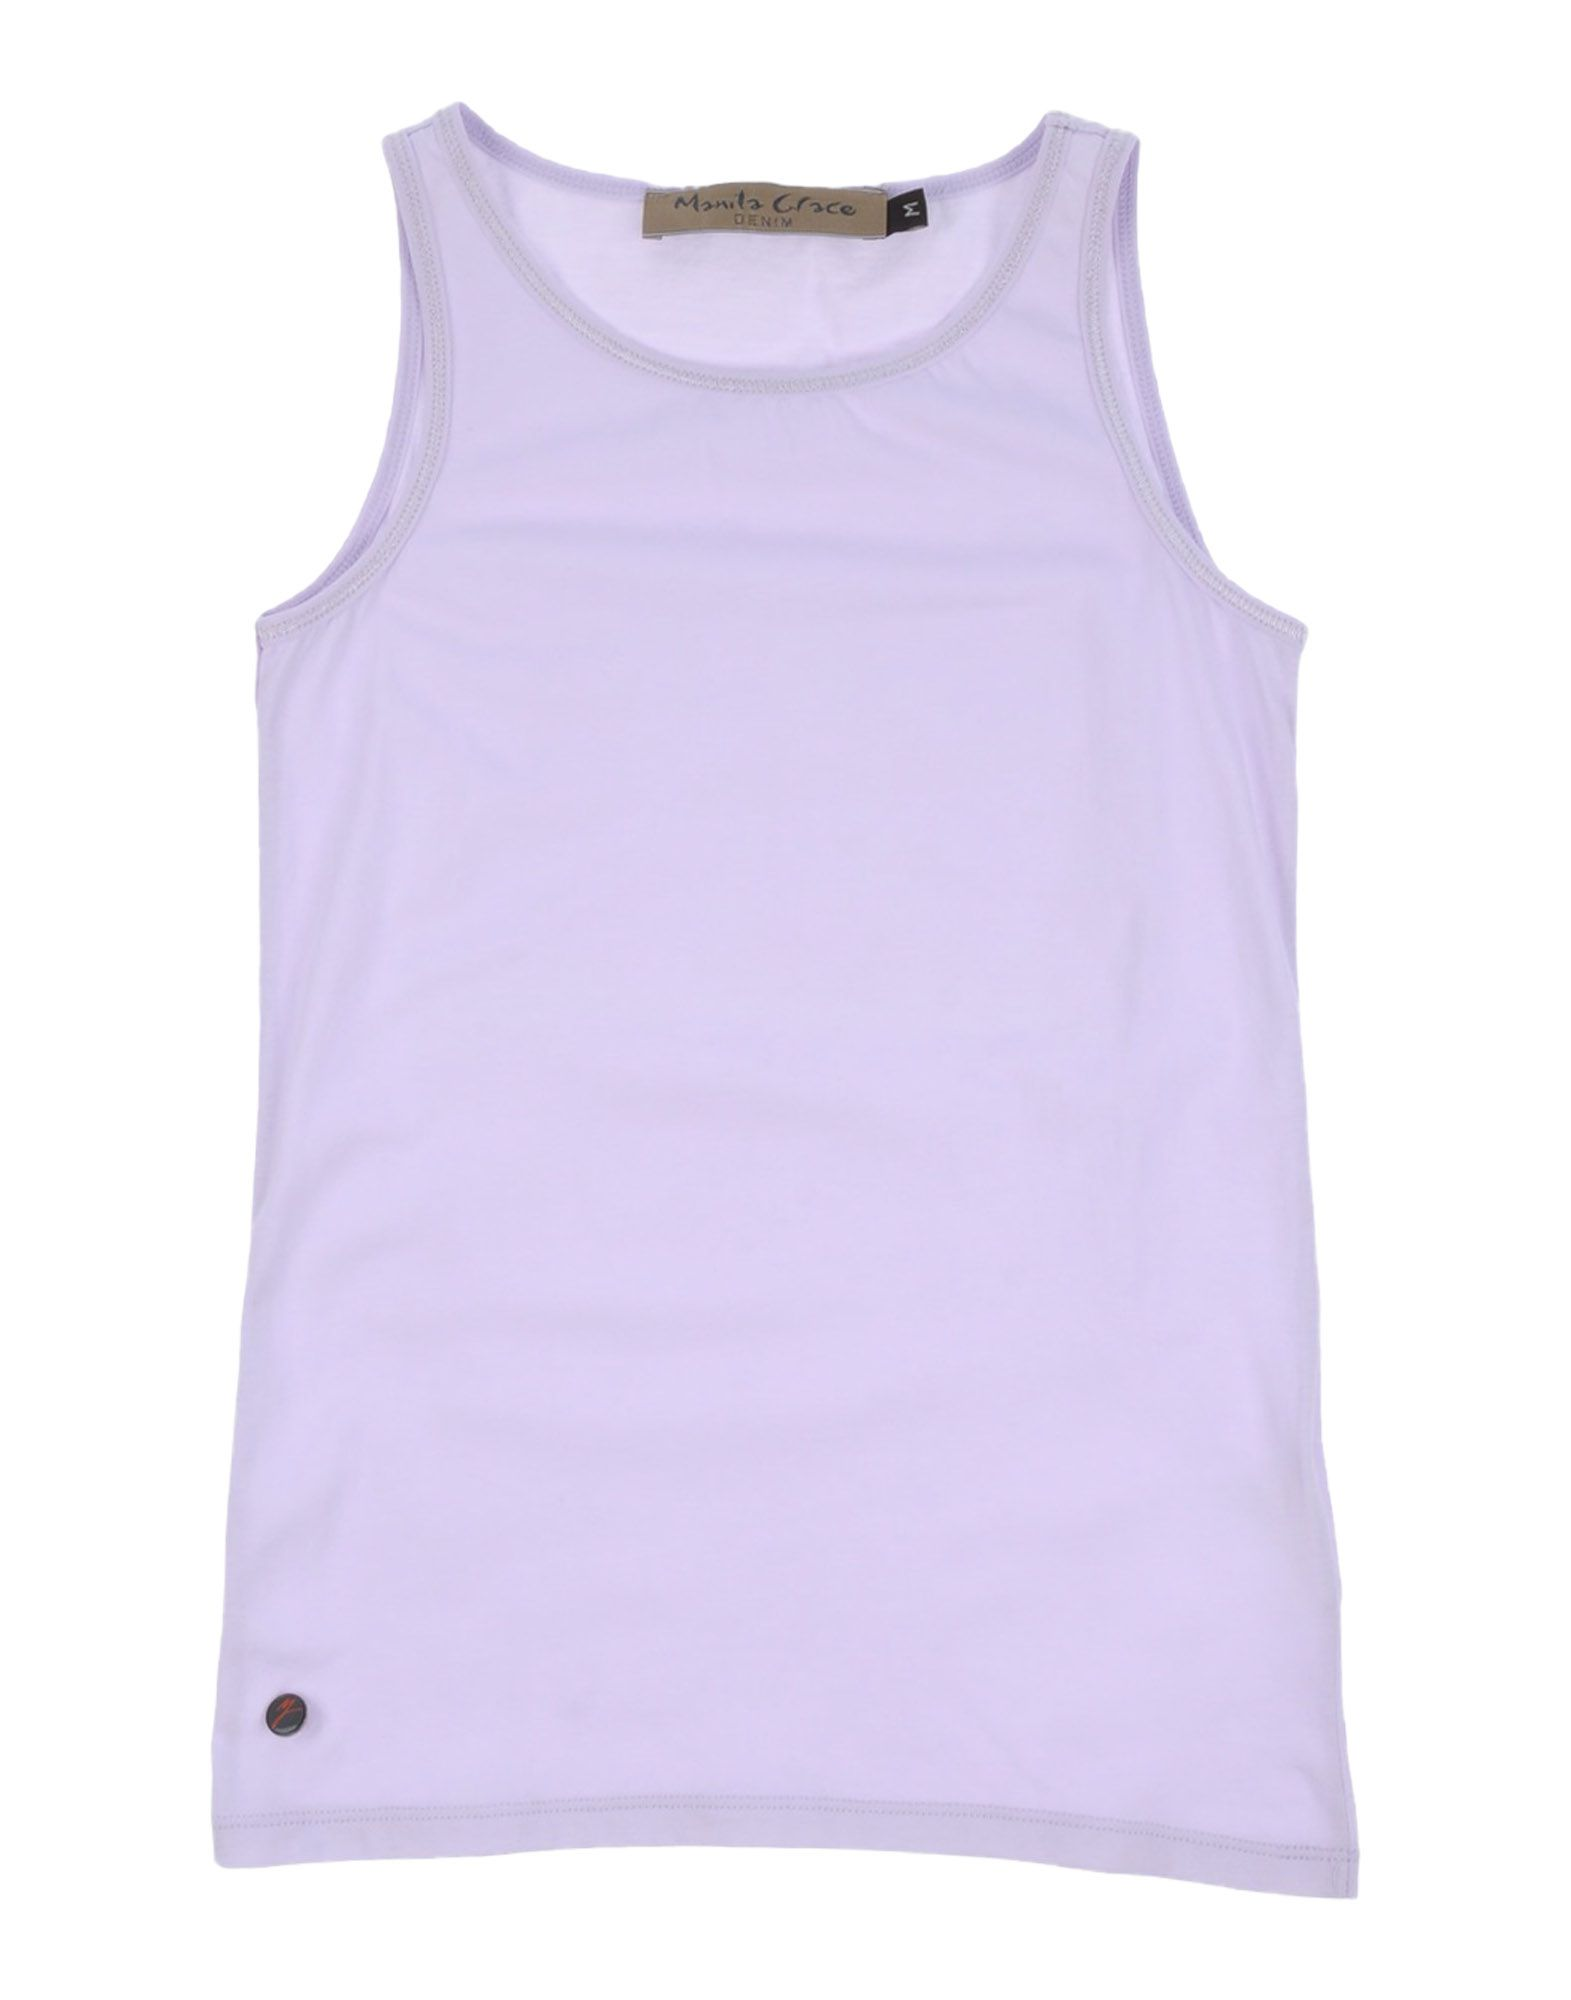 Manila Grace Denim Kids' T-shirts In Purple